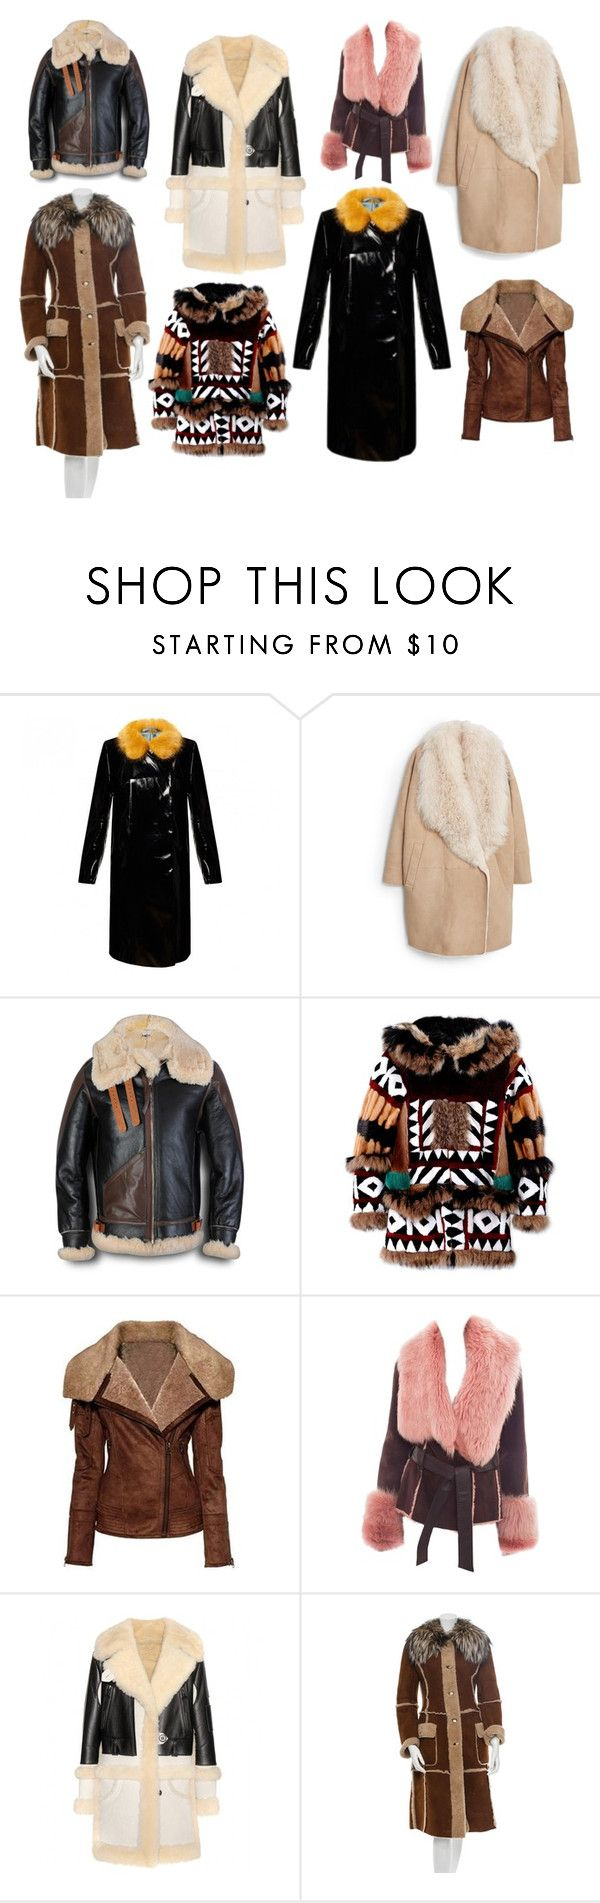 дубленки и кож.пальто 15-16 by tatyana-yurasova on Polyvore featuring мода, Dsquared2, Coach, Dolce&Gabbana, MANGO and Temperley London